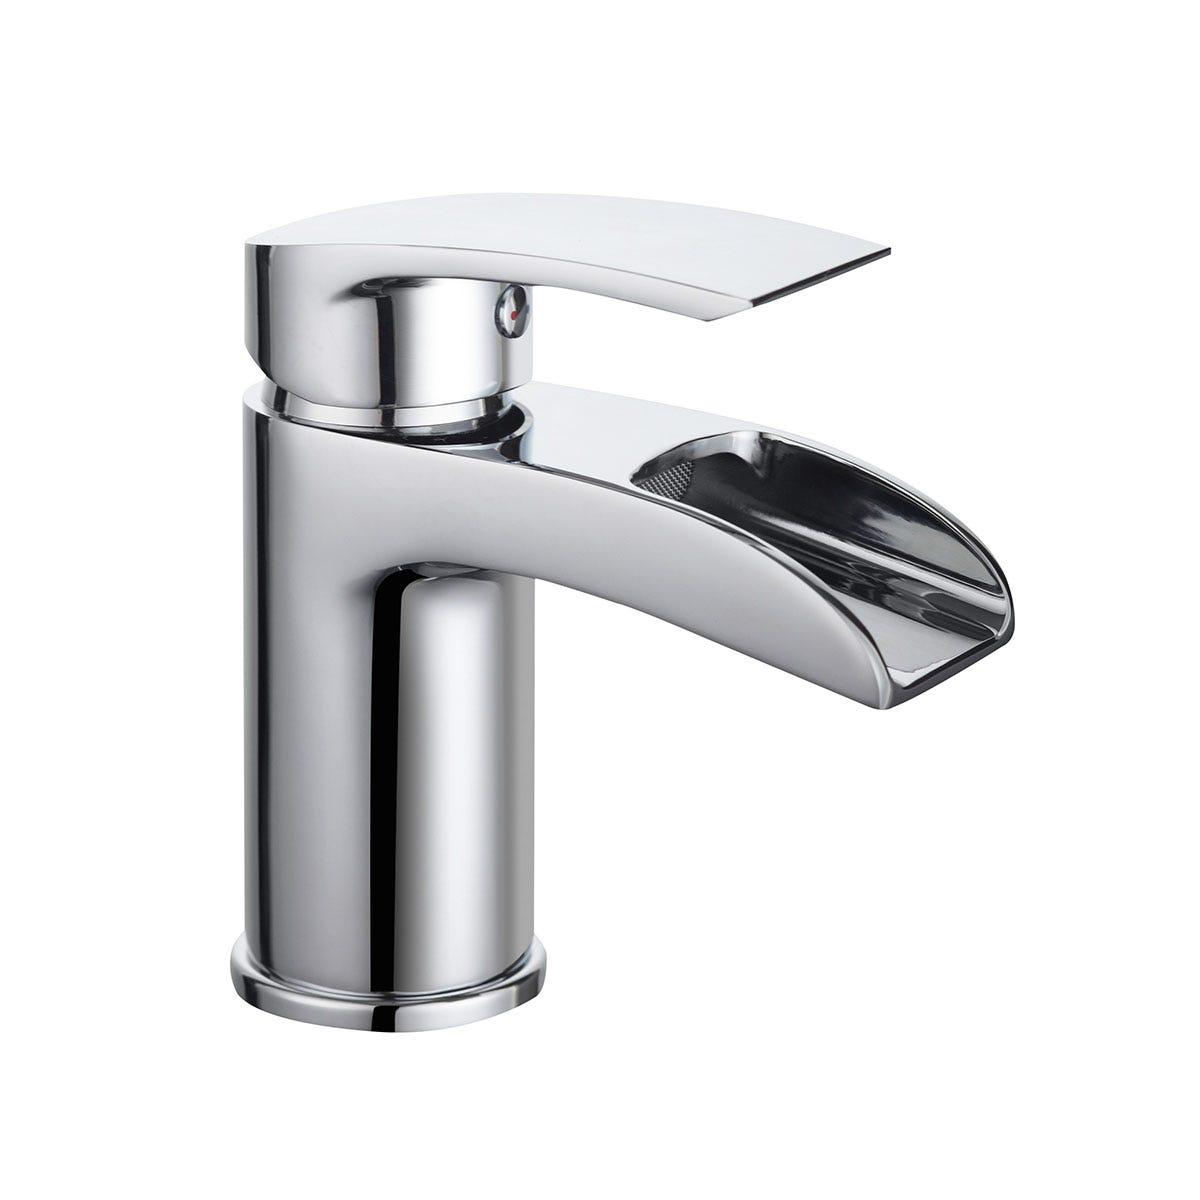 Bristan Glide Waterfall Basin Mixer - Chrome